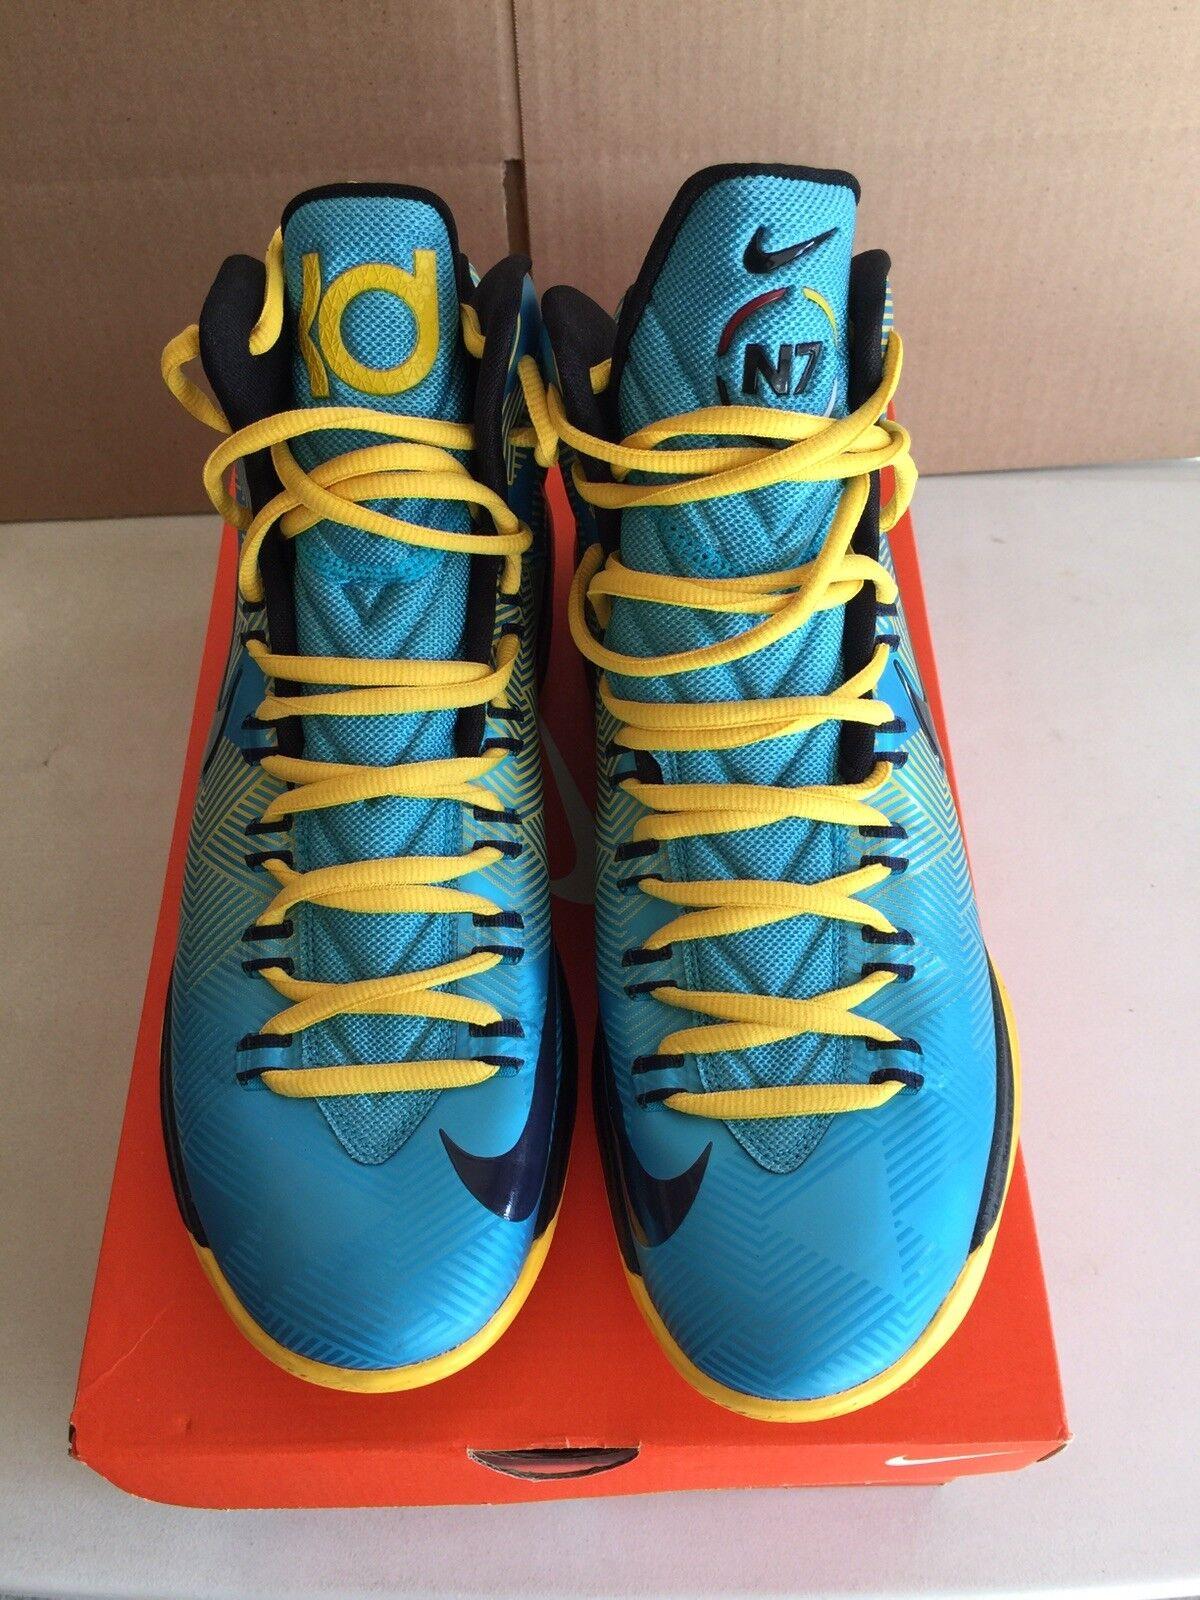 Nike Kevin Durant KD 5 V High N7 Edition shoes Mens Sz 10.5 bluee 599294-447